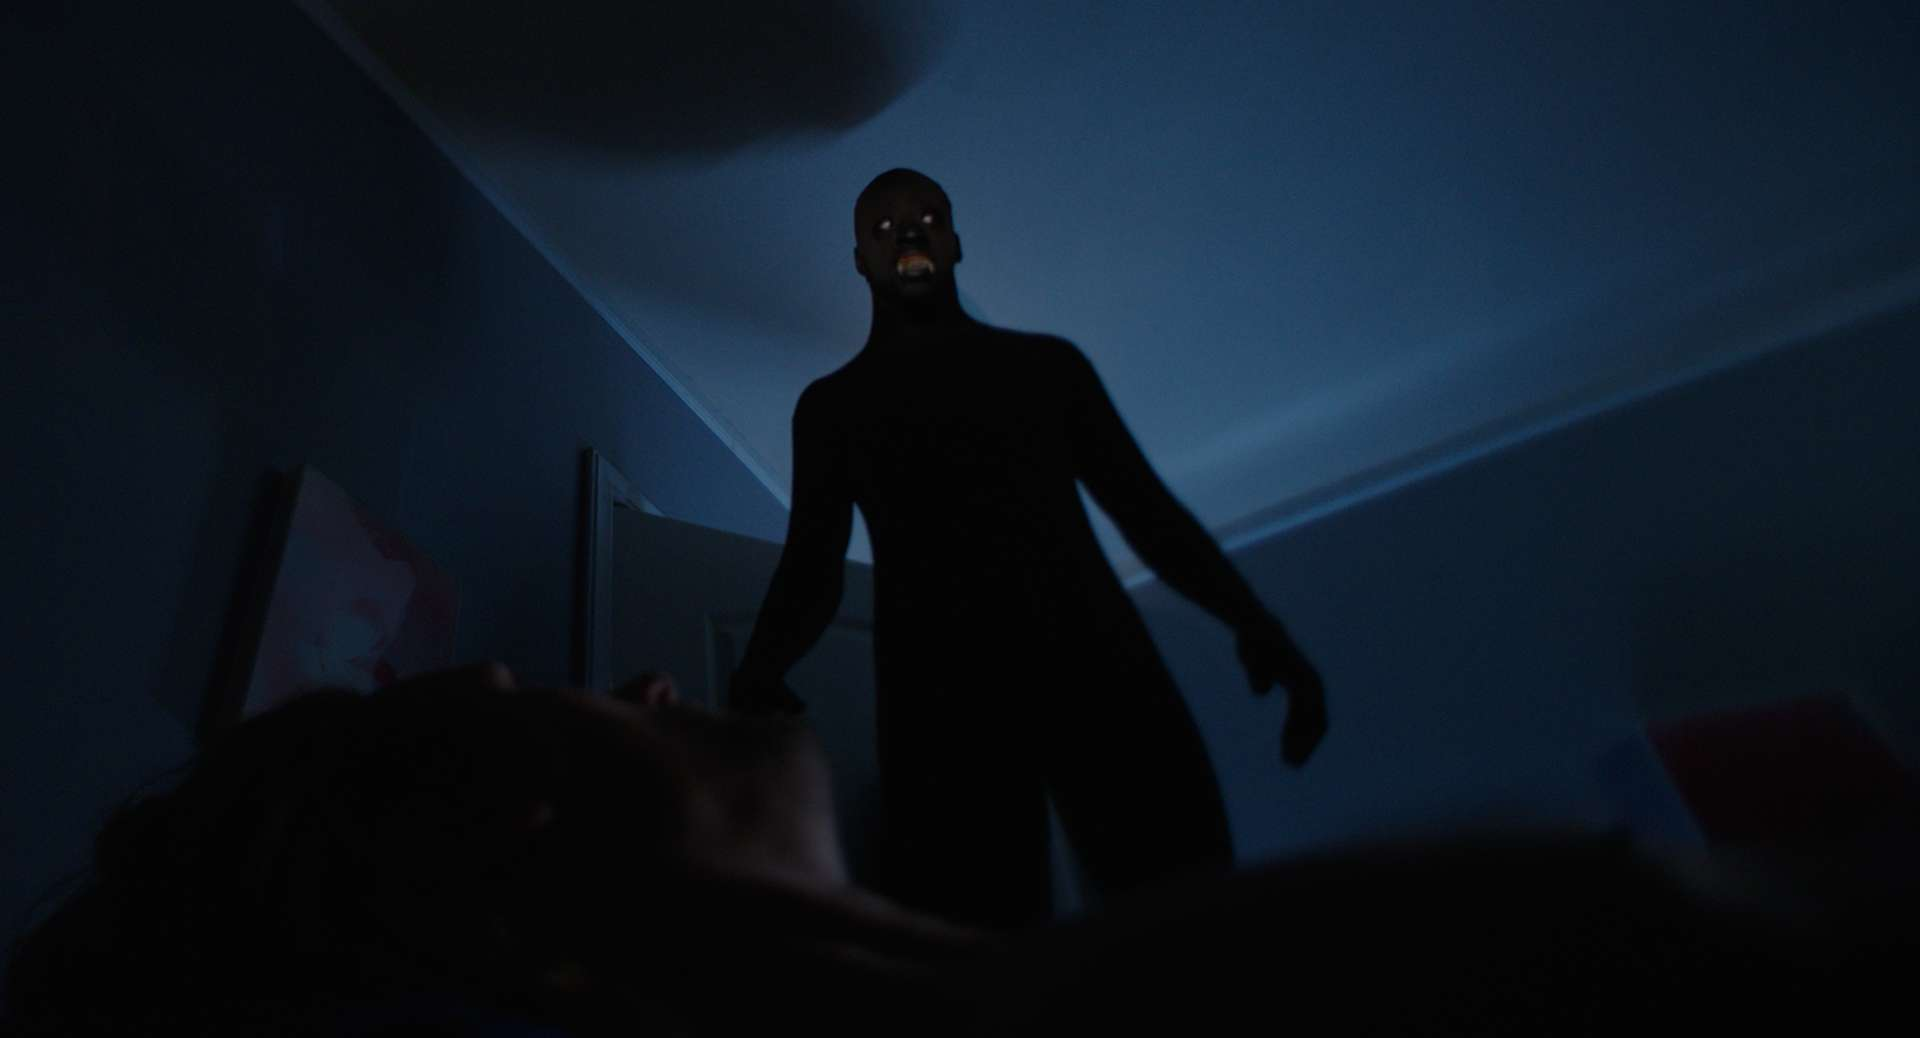 THE-NIGHTMARE-Shadowman